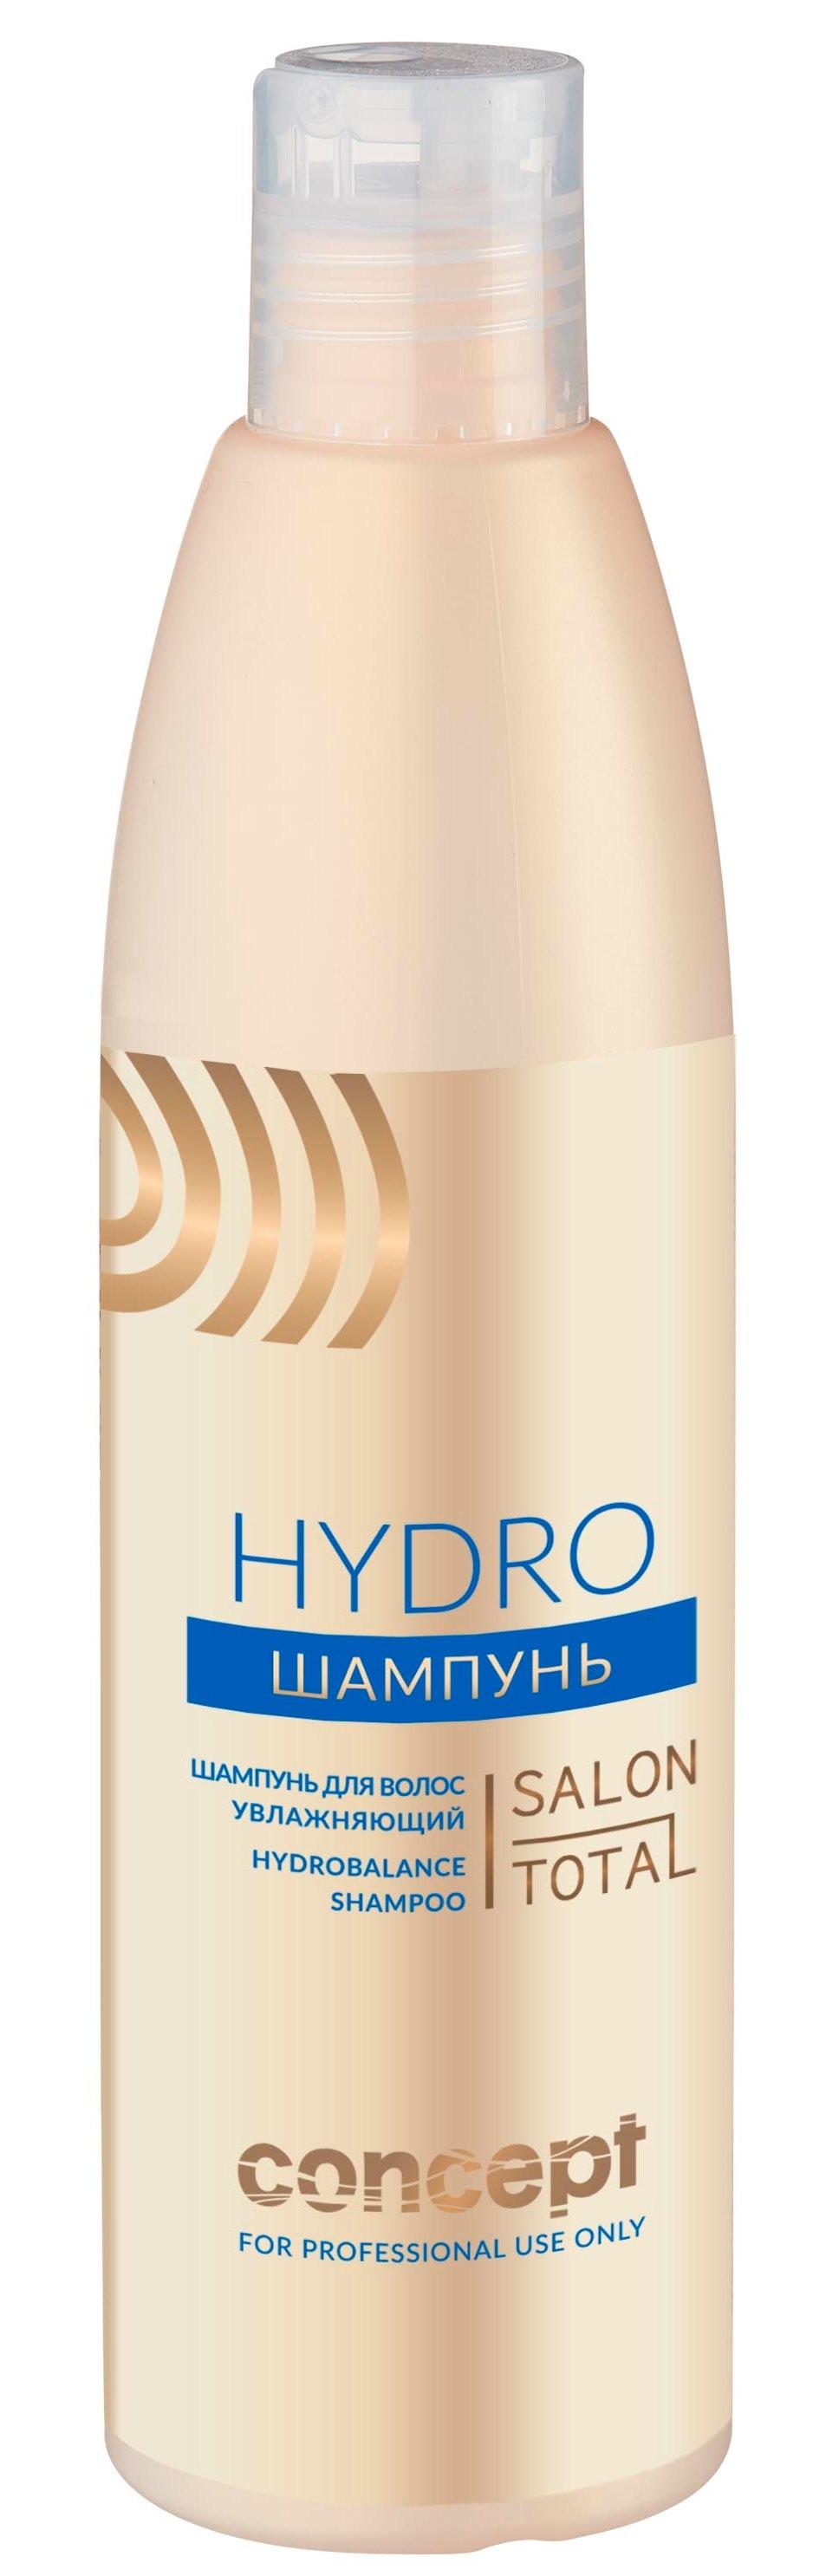 Фото - Concept Шампунь Hydrobalance Shampoo Увлажняющий, 300 мл concept шампунь активатор роста волос active hair growth shampoo 300 мл concept green line